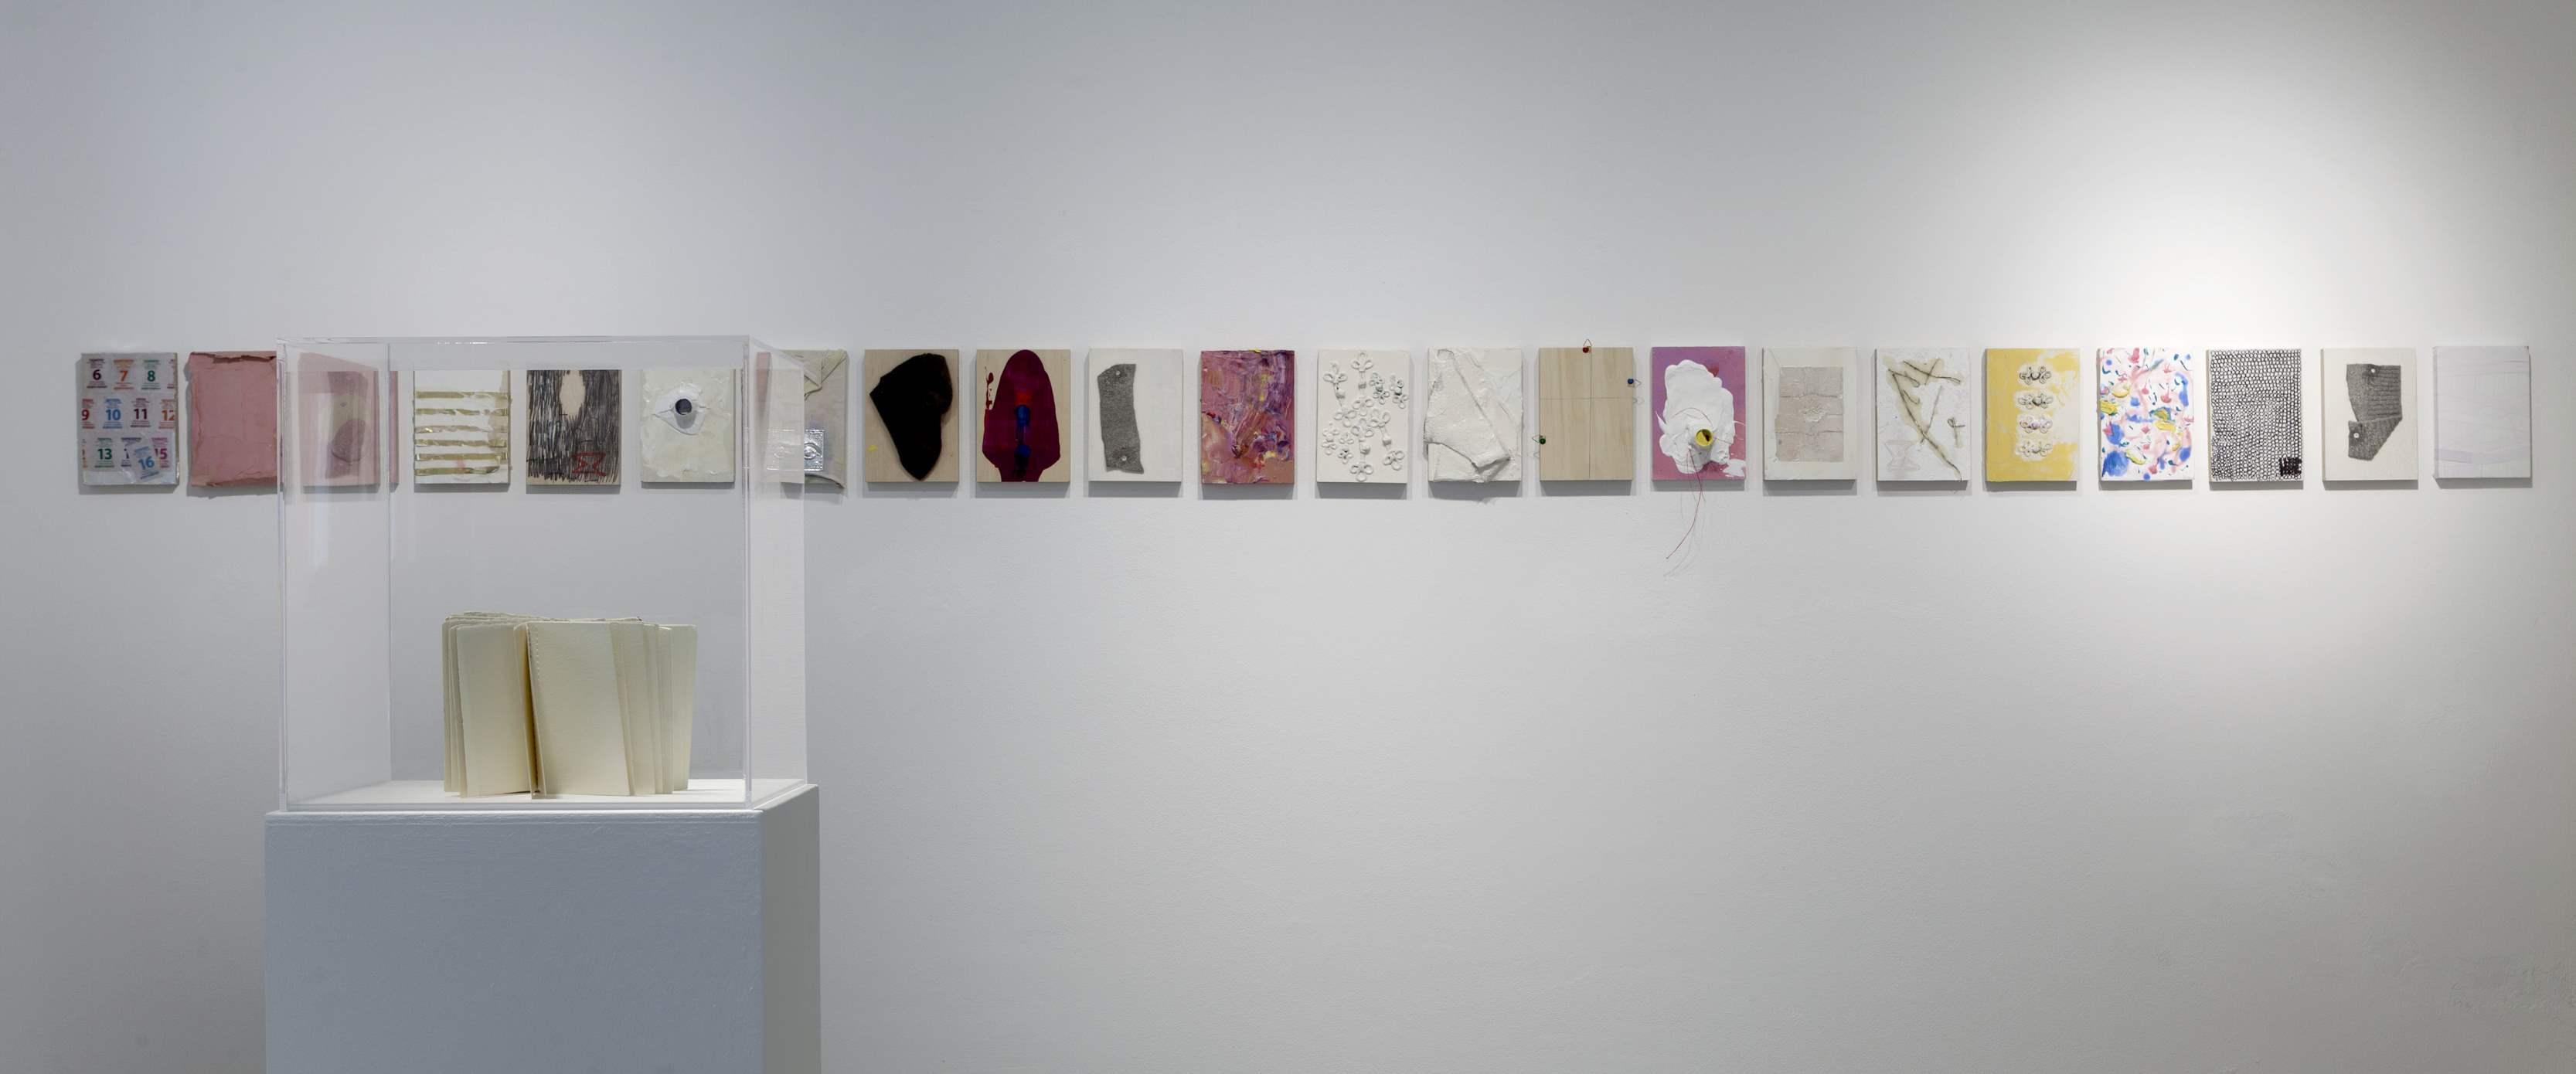 Installation view, Marignana Arte, Hotel nostos. Humble, nimble, dreamlike tumble, Sofia Stevi, Spine book, 2009, diary series